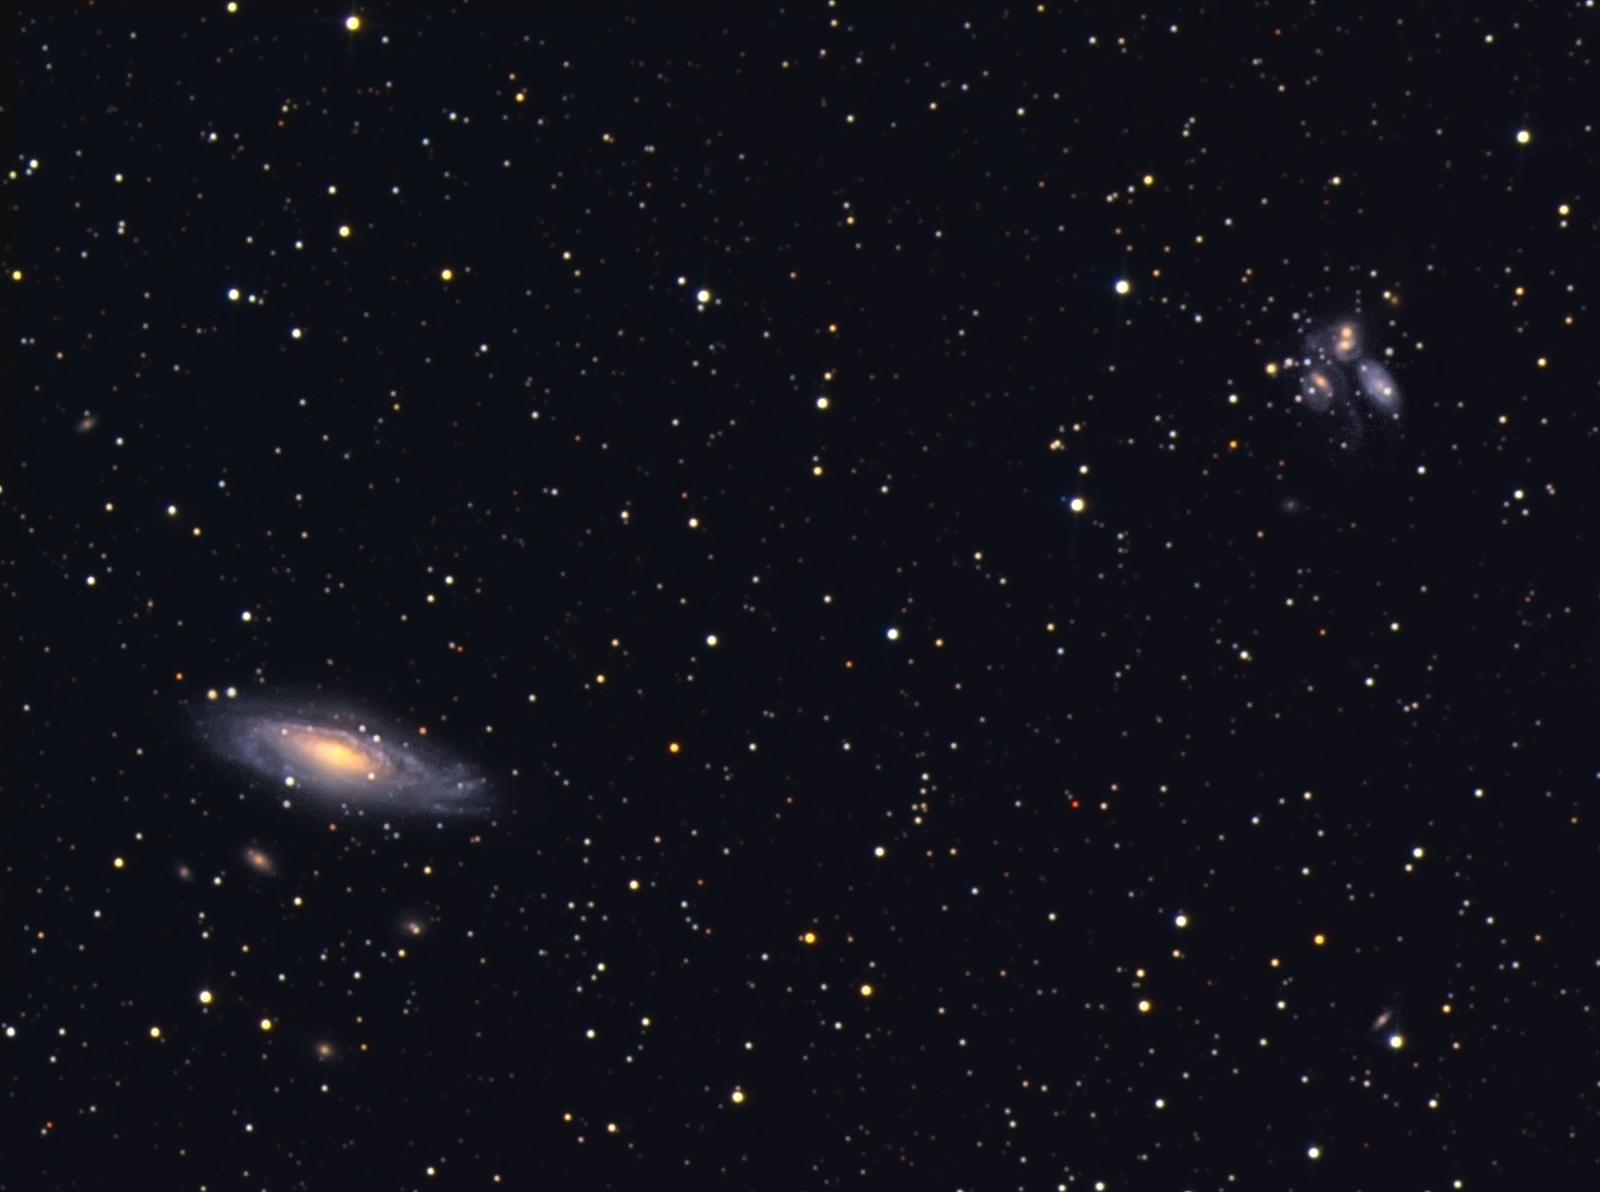 NGC7331_RGB_sharp.thumb.jpg.d949c1f1f0f594f4bf154c5a14e80e03.jpg